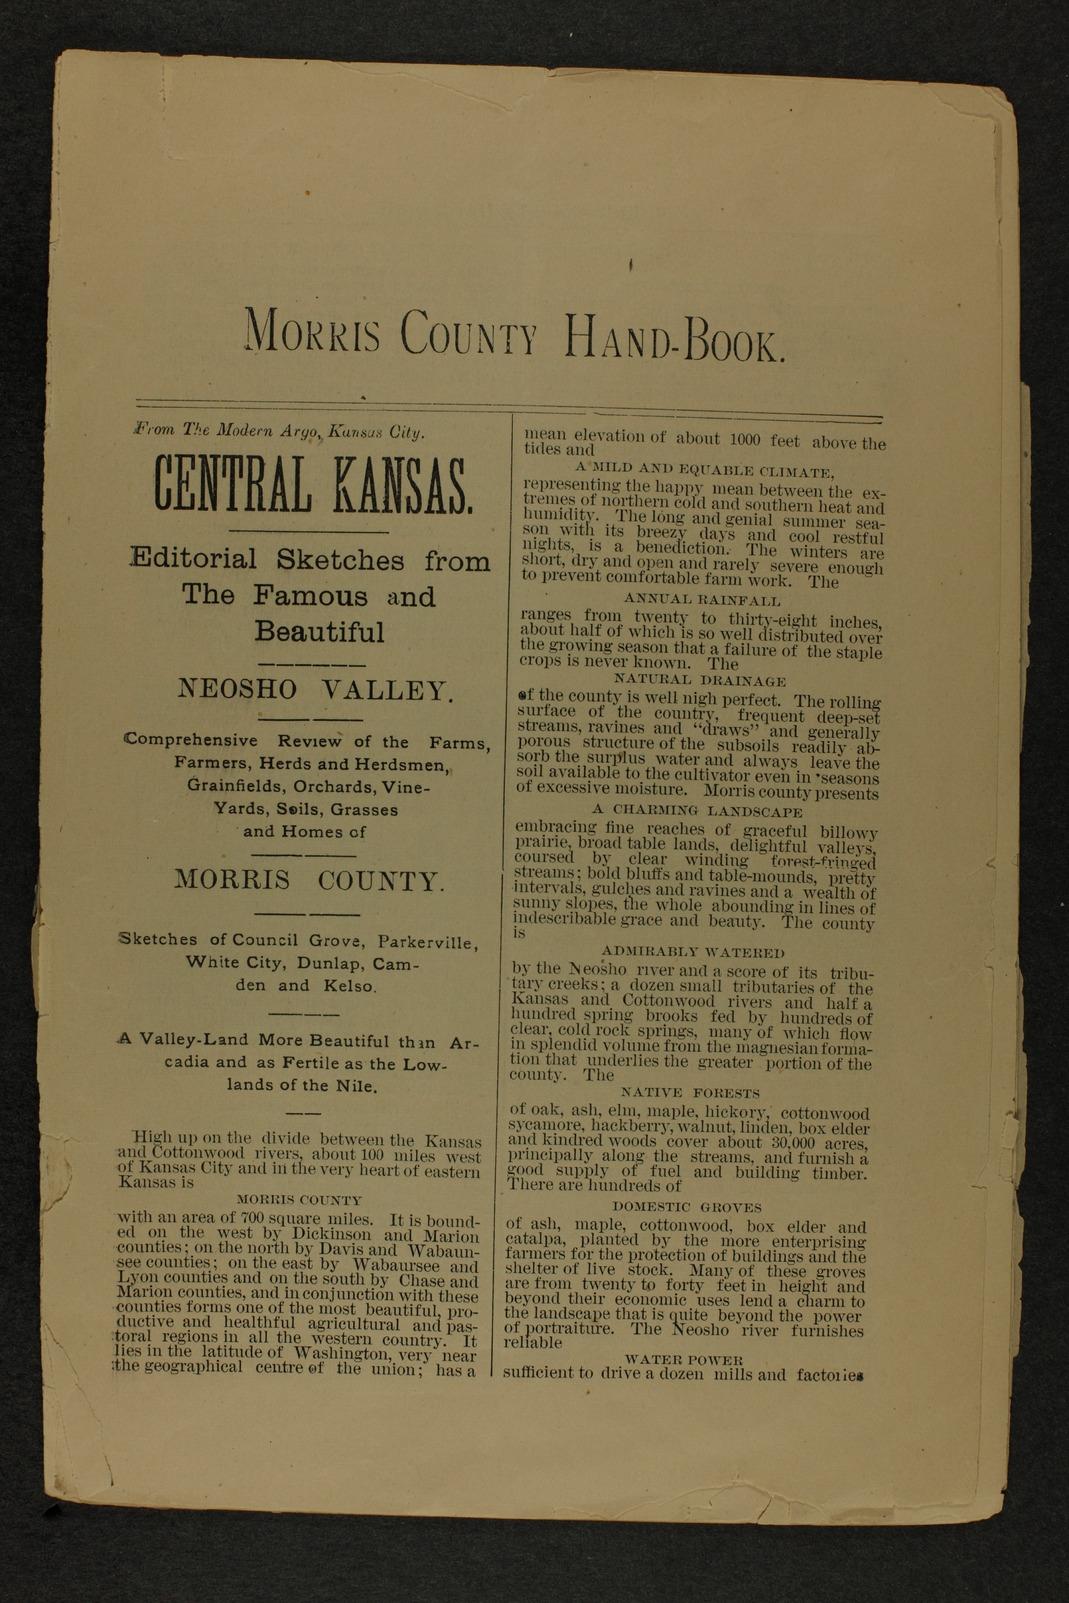 Handbook of Morris County, Kansas - 1